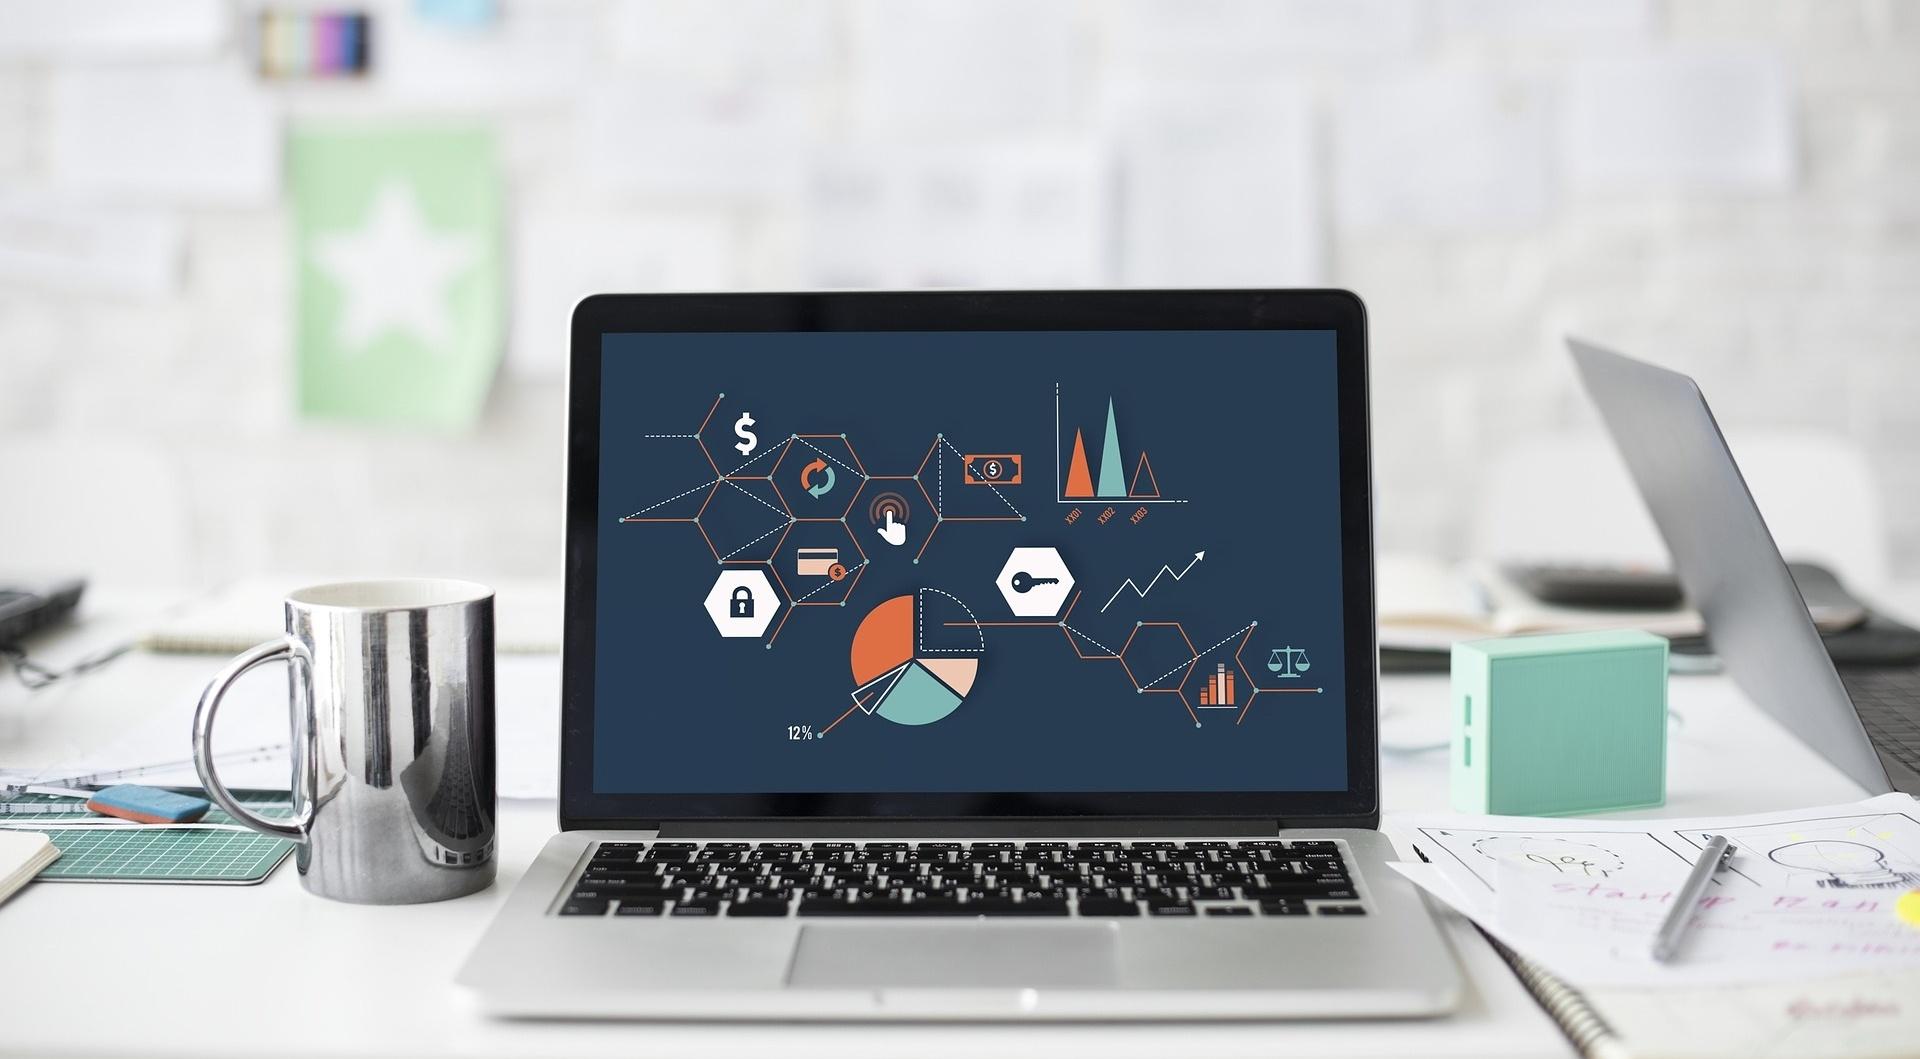 analytics-bics-inteligenica-empresarial-257346-edited.jpg